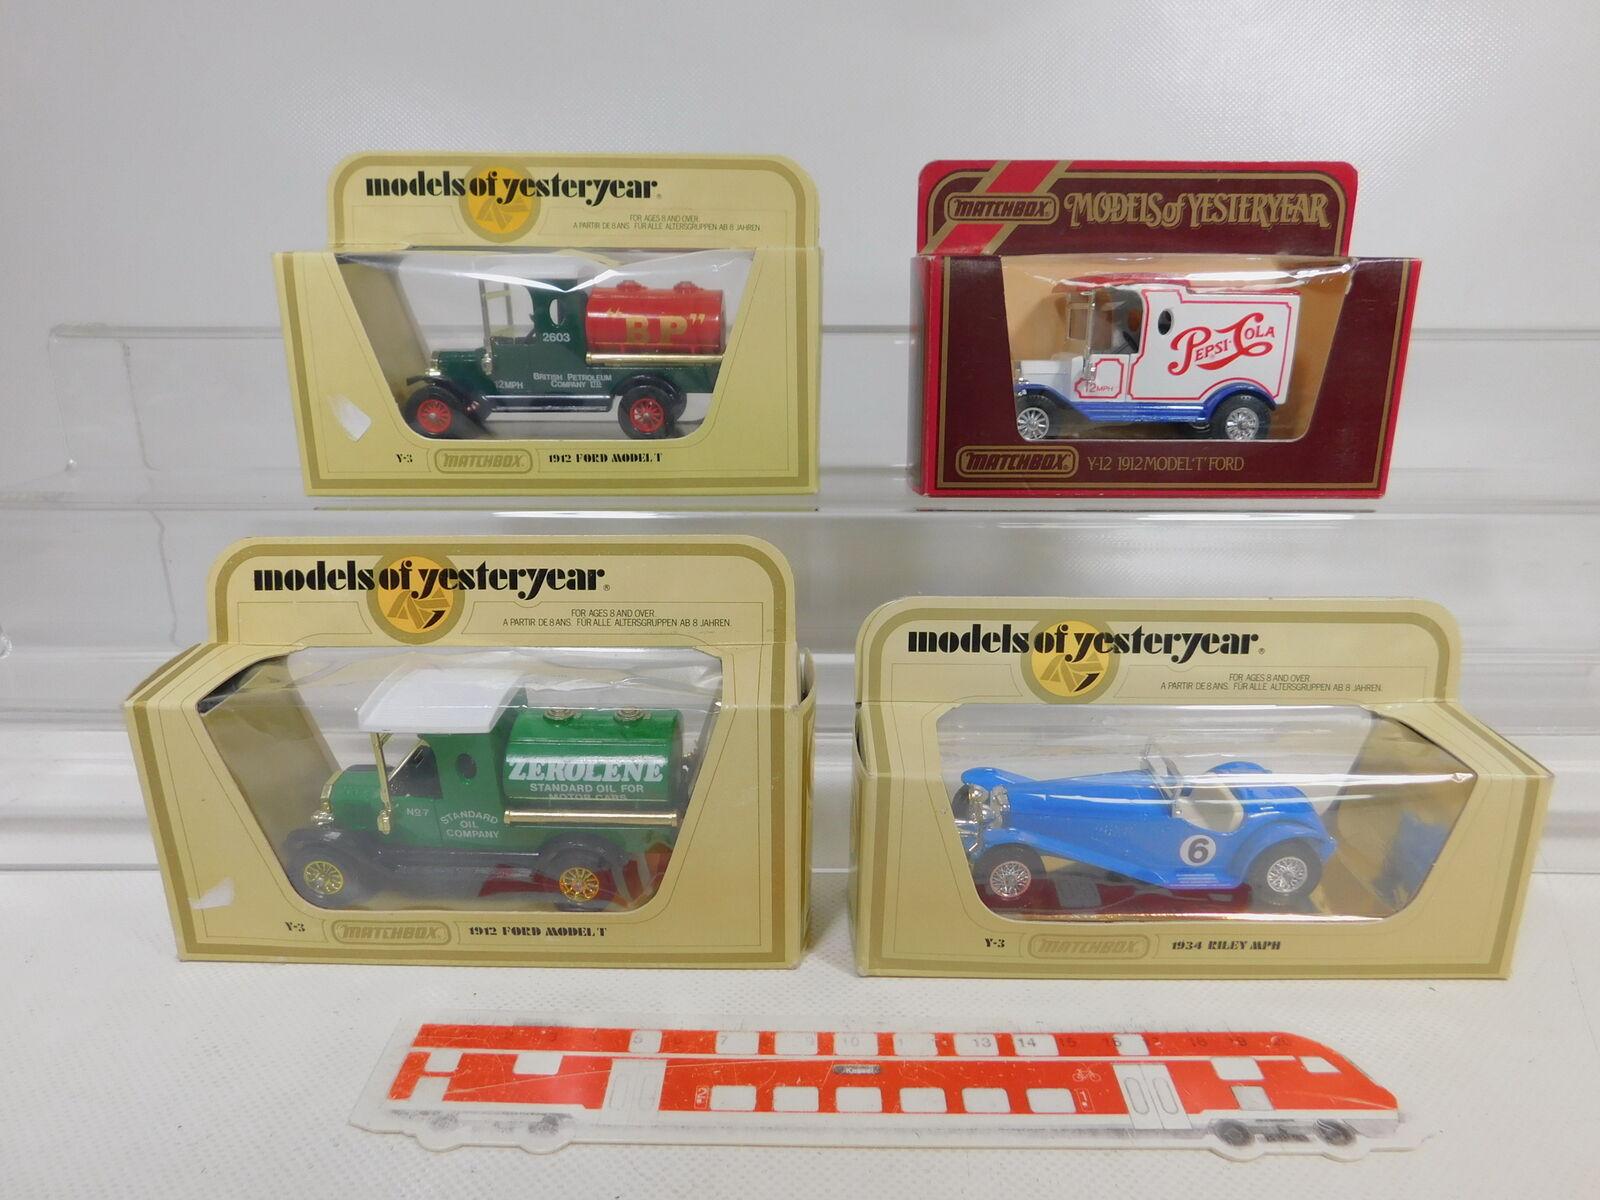 Ca184-1  4x MATCHBOX 1 35 Modèle  y-12 PEPSI + y-3 Ford Model T Riley, P. G + neuf dans sa boîte